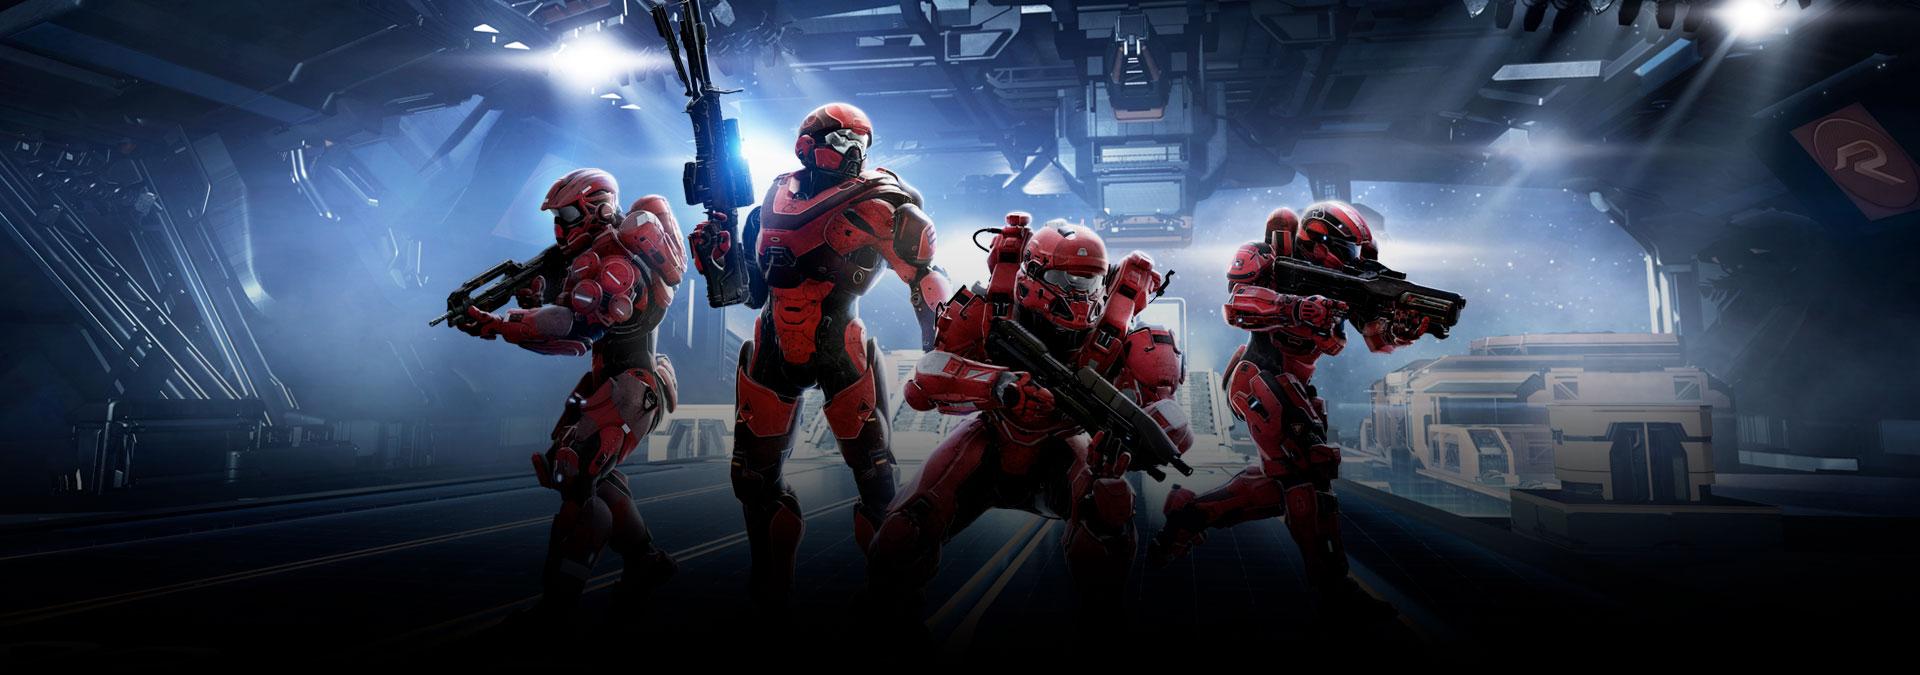 Matchmaking problemen Halo 5 Beta online dating site 100 gratis